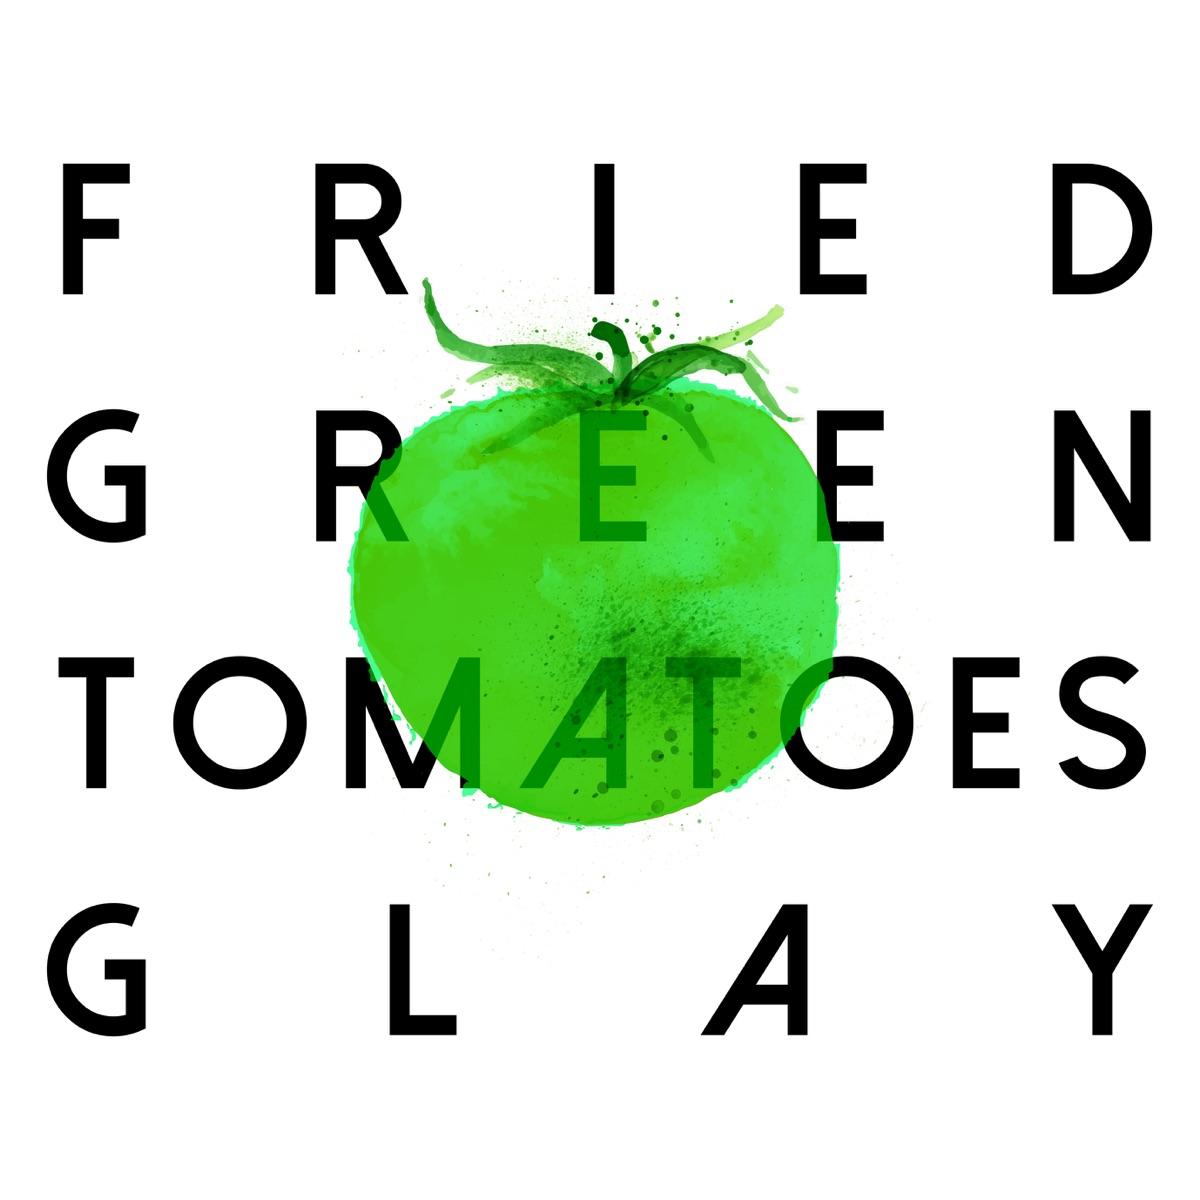 『GLAY - FRIED GREEN TOMATOES』収録の『FRIED GREEN TOMATOES』ジャケット